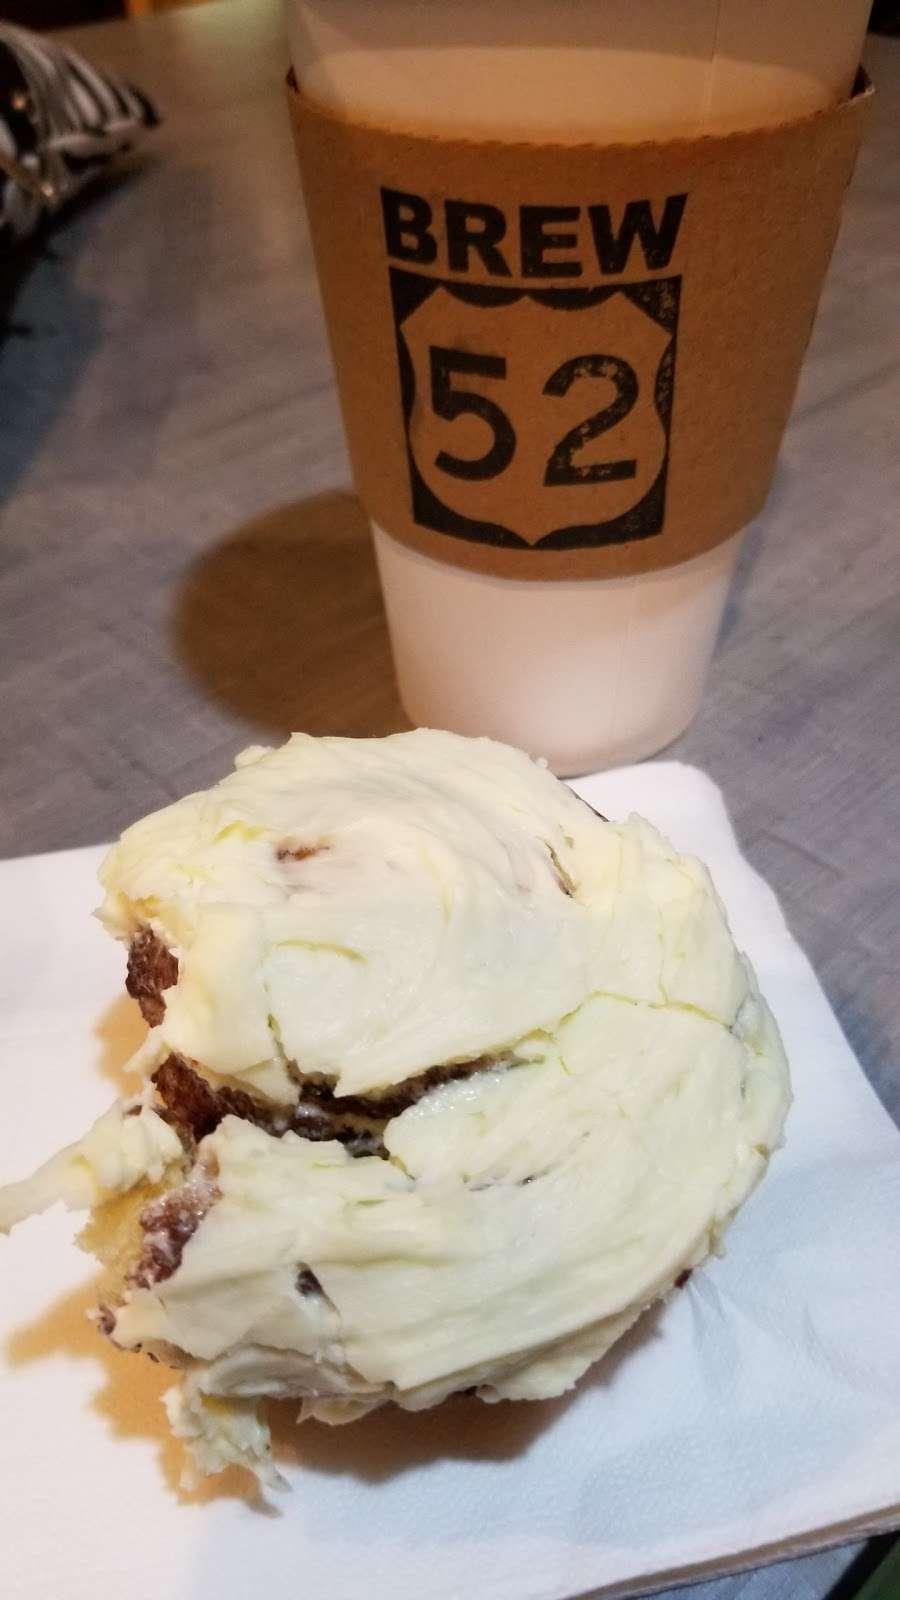 Brew 52 - cafe  | Photo 3 of 10 | Address: 4346 County Rd 500 W, New Palestine, IN 46163, USA | Phone: (317) 861-7019